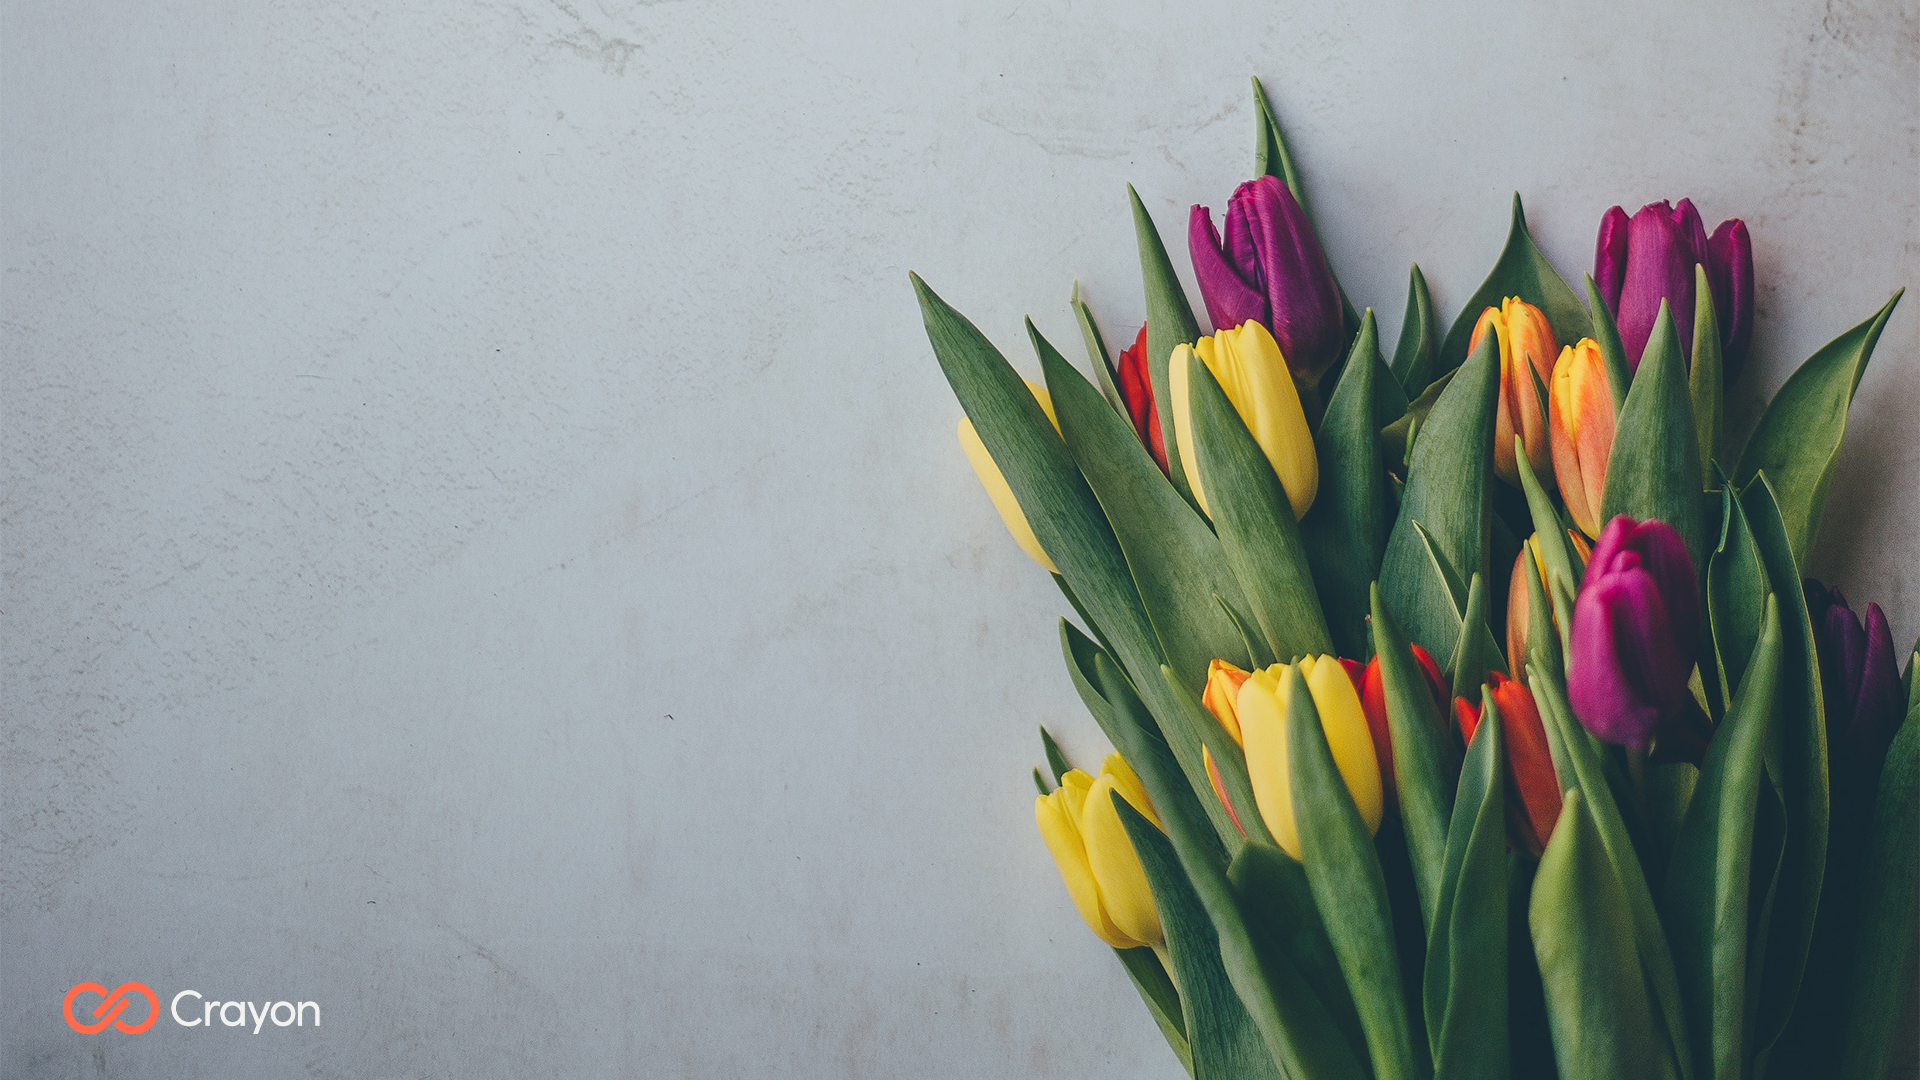 https://www.crayon.com/globalassets/us/seasonal-backgrounds/spring-2021/microsoft-teams-background-tulips.png?